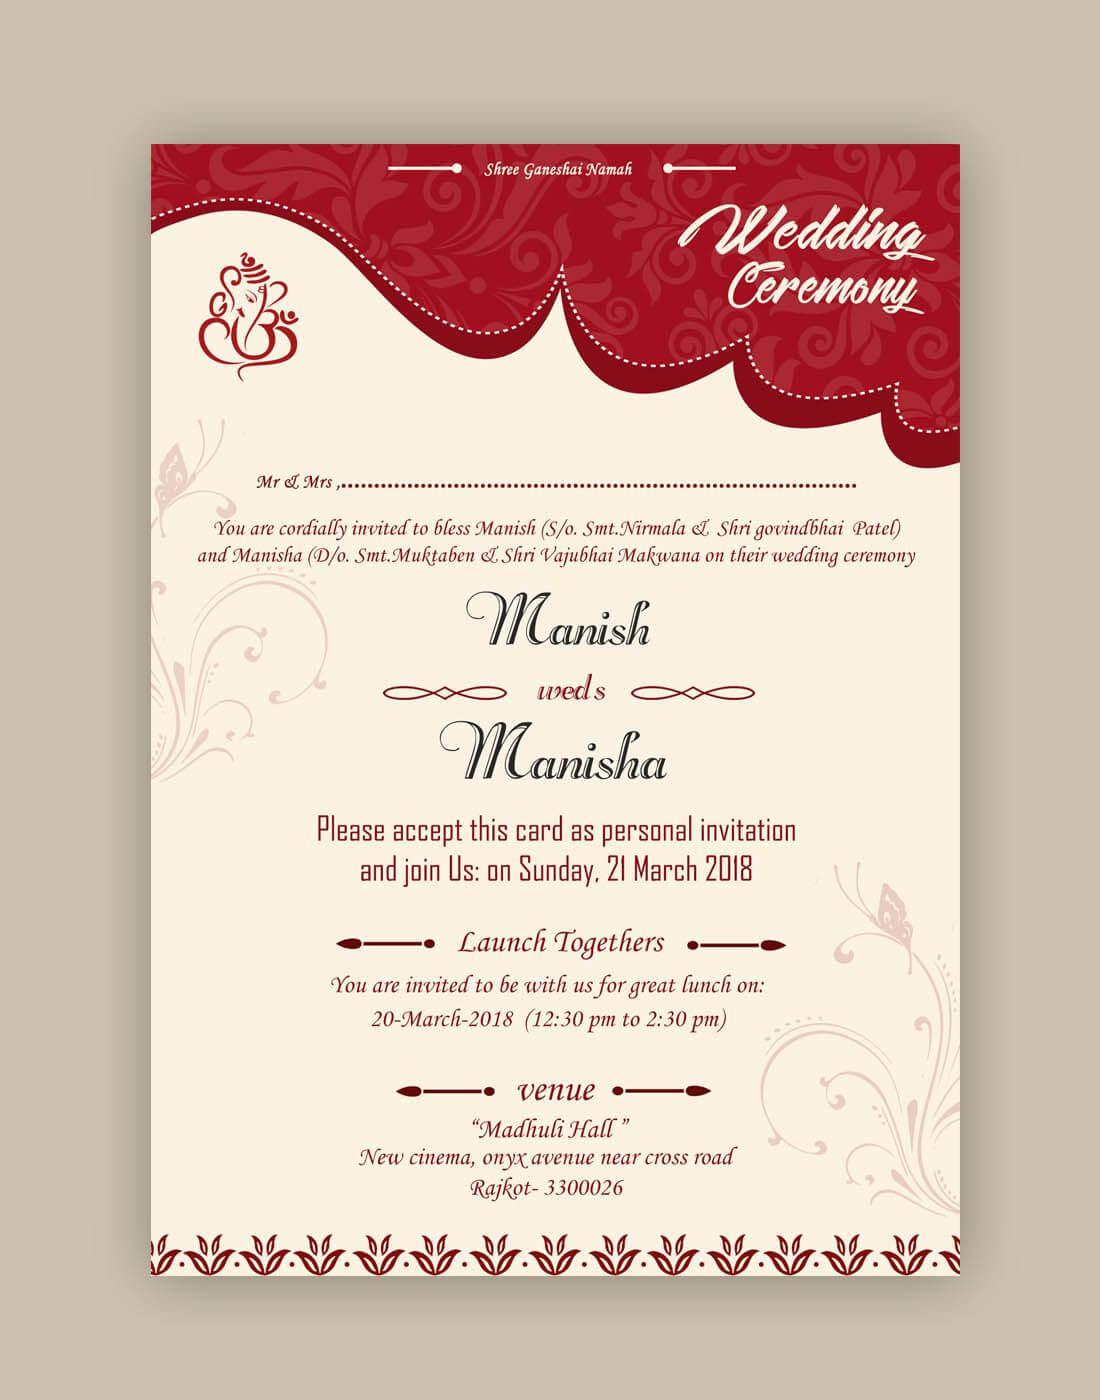 Free Wedding Card Psd Templates   Kankotri Vector Template Regarding Indian Wedding Cards Design Templates